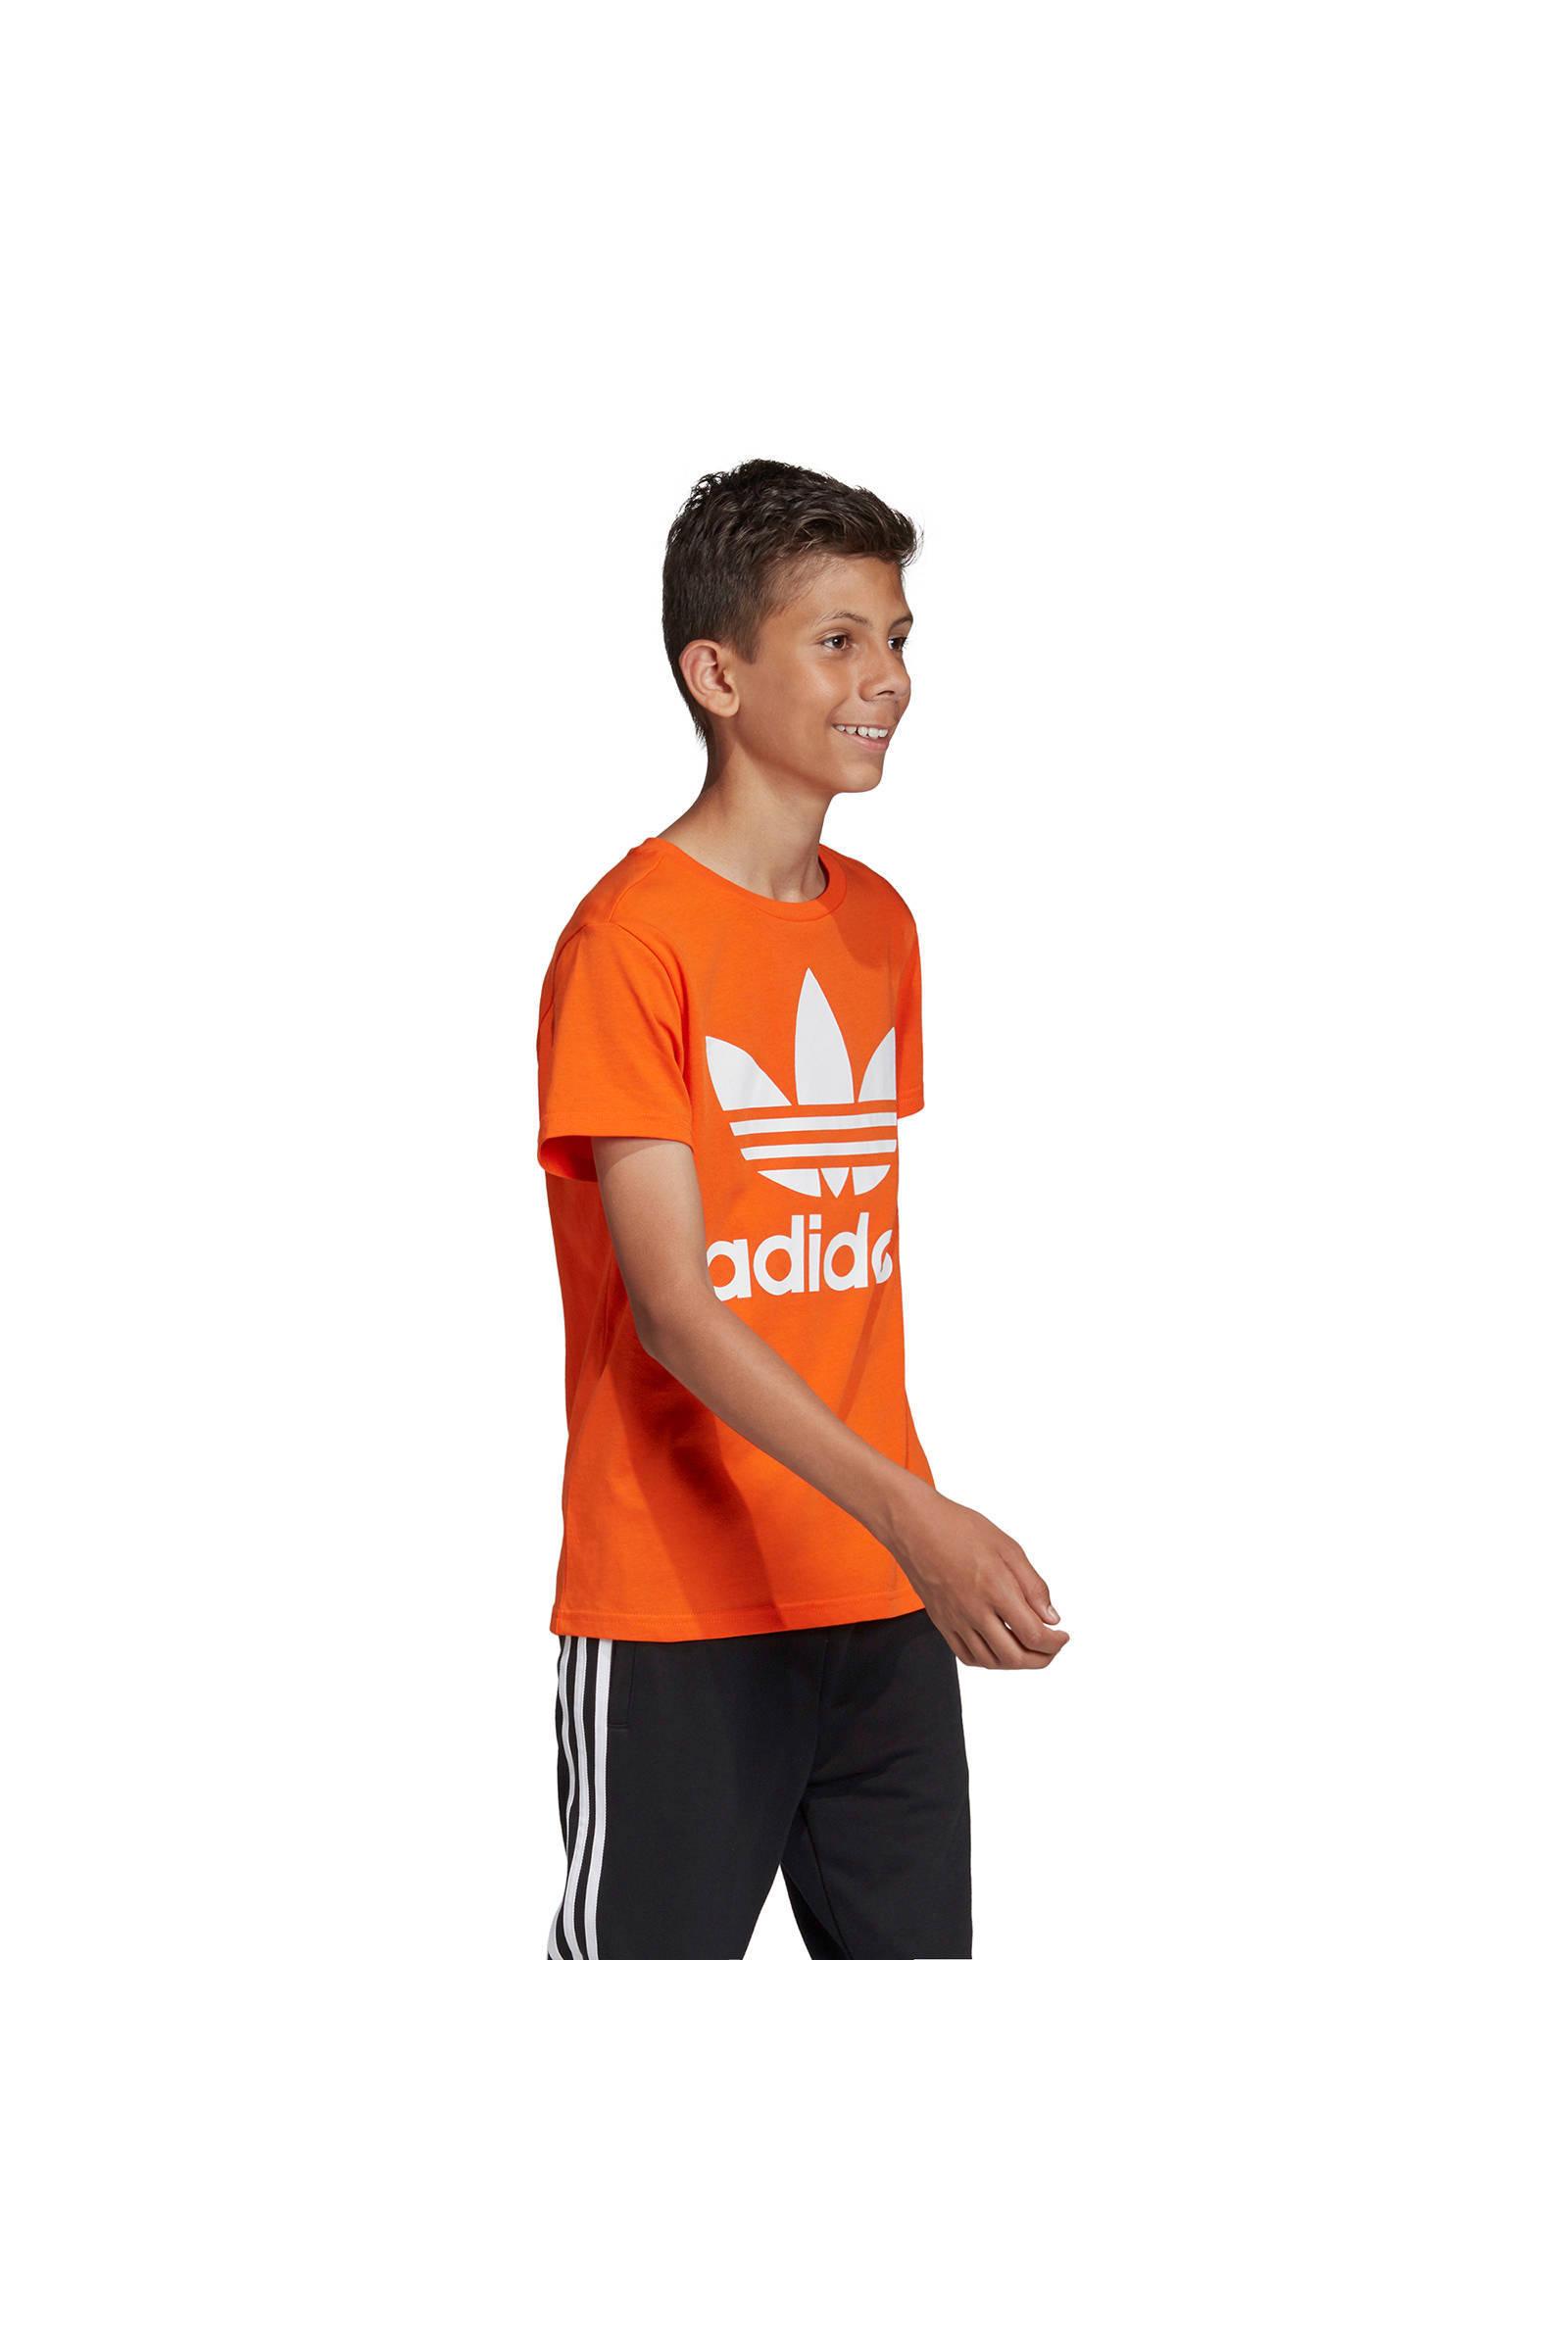 adidas originals Adicolor T shirt oranje | wehkamp